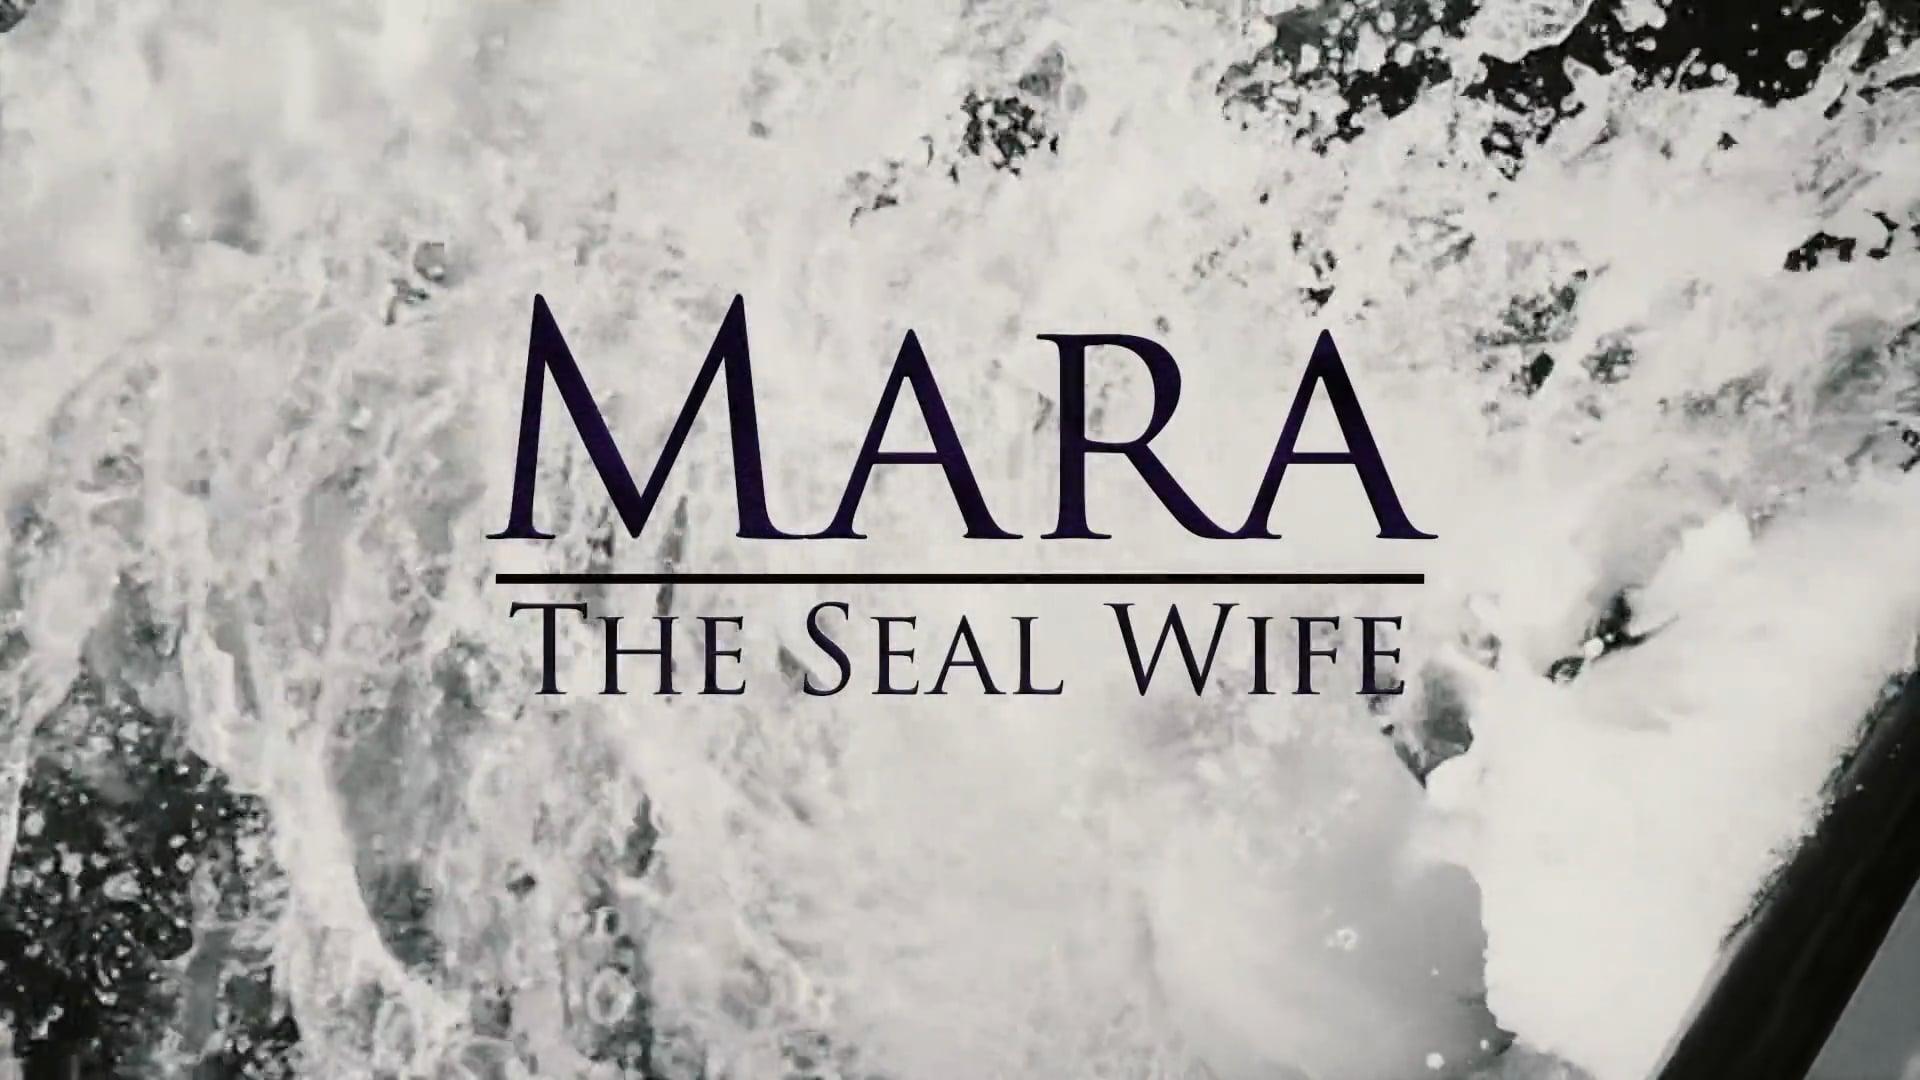 Mara: The Seal Wife - Behind The Scenes Vignette